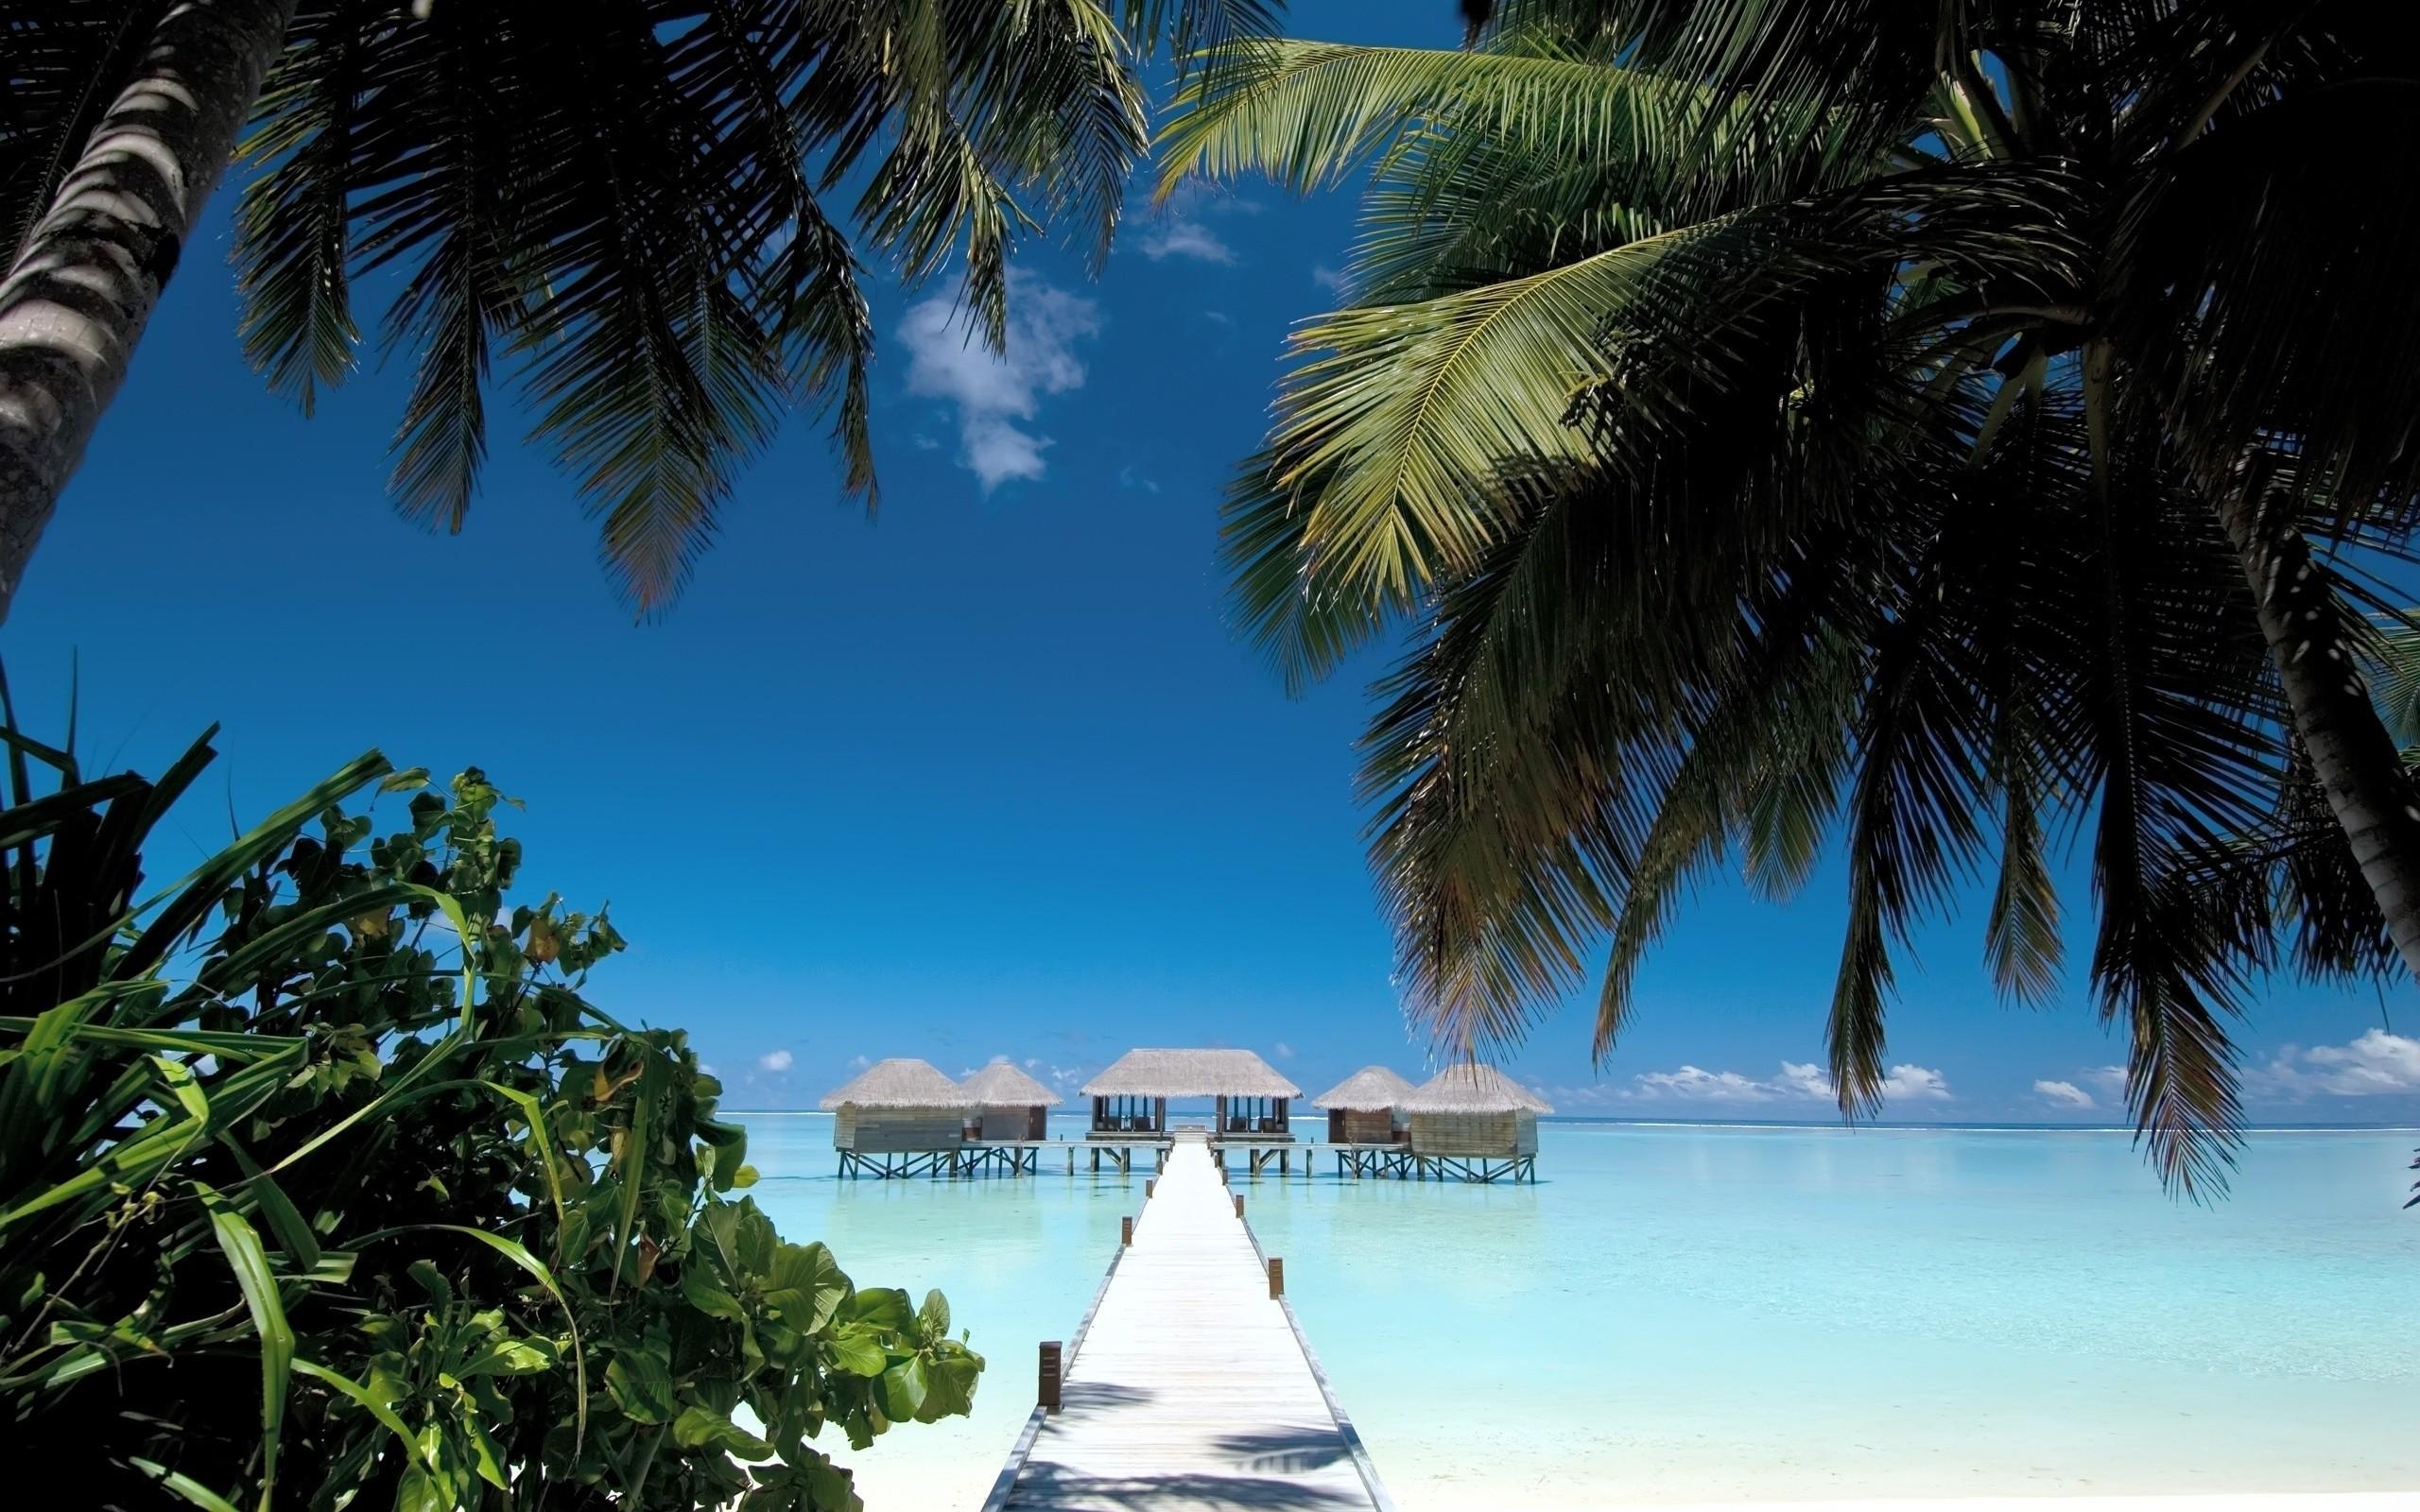 Maldives Wallpaper 67 Images